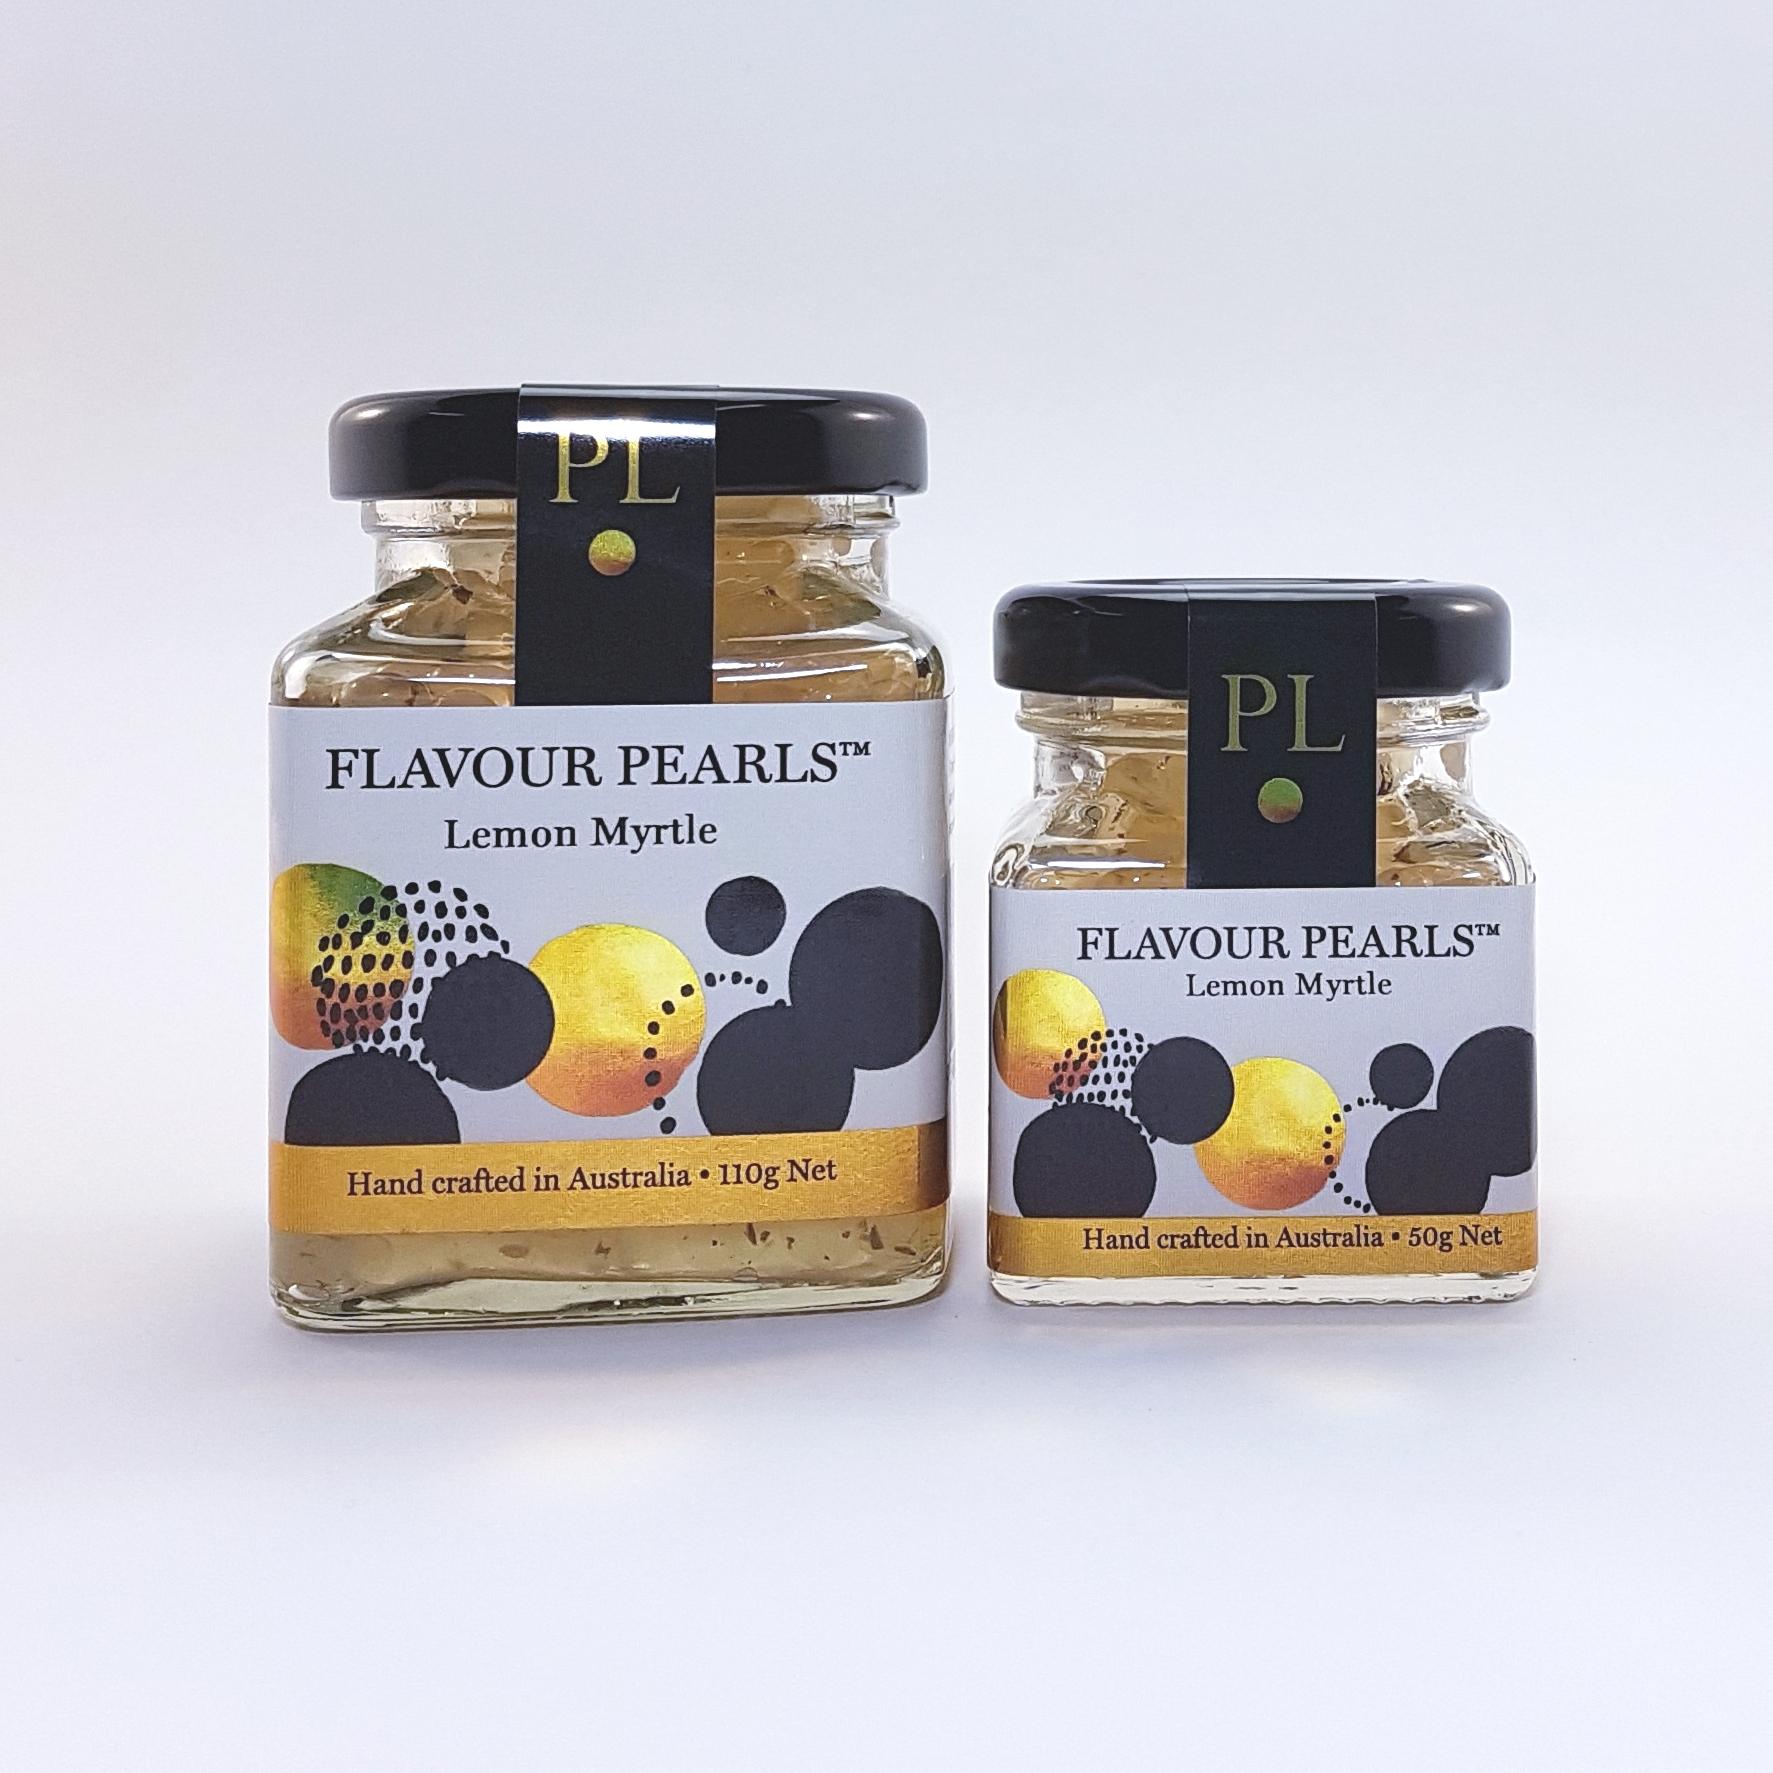 Lemon Myrtle Flavour Pearls 110g and 50g Jars